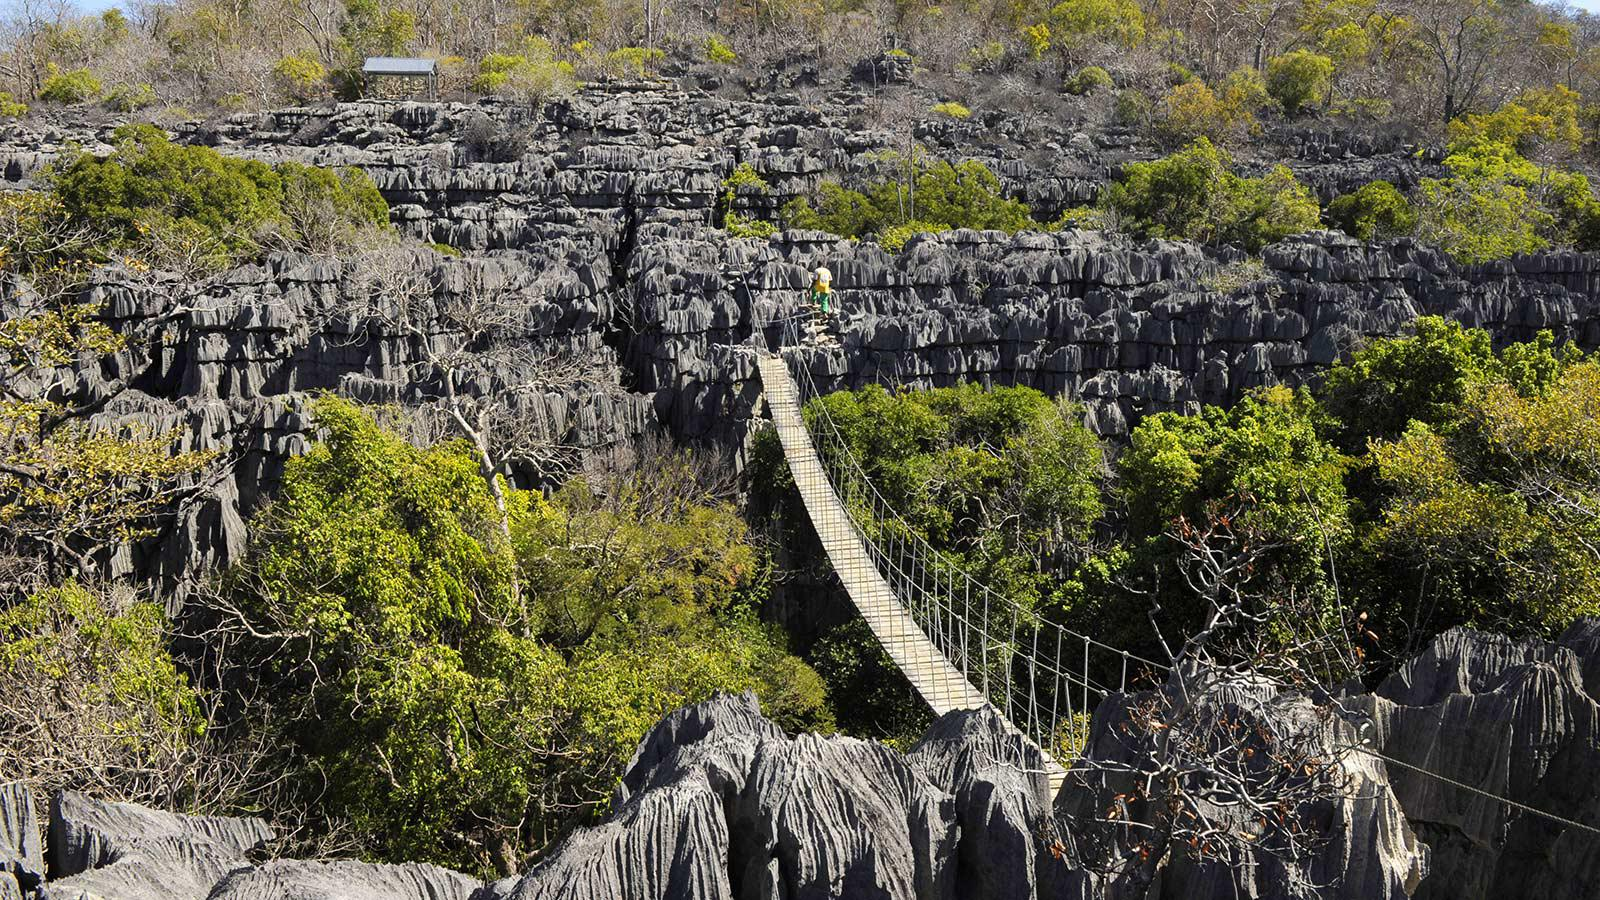 Madagascar National Parks, Ankarana